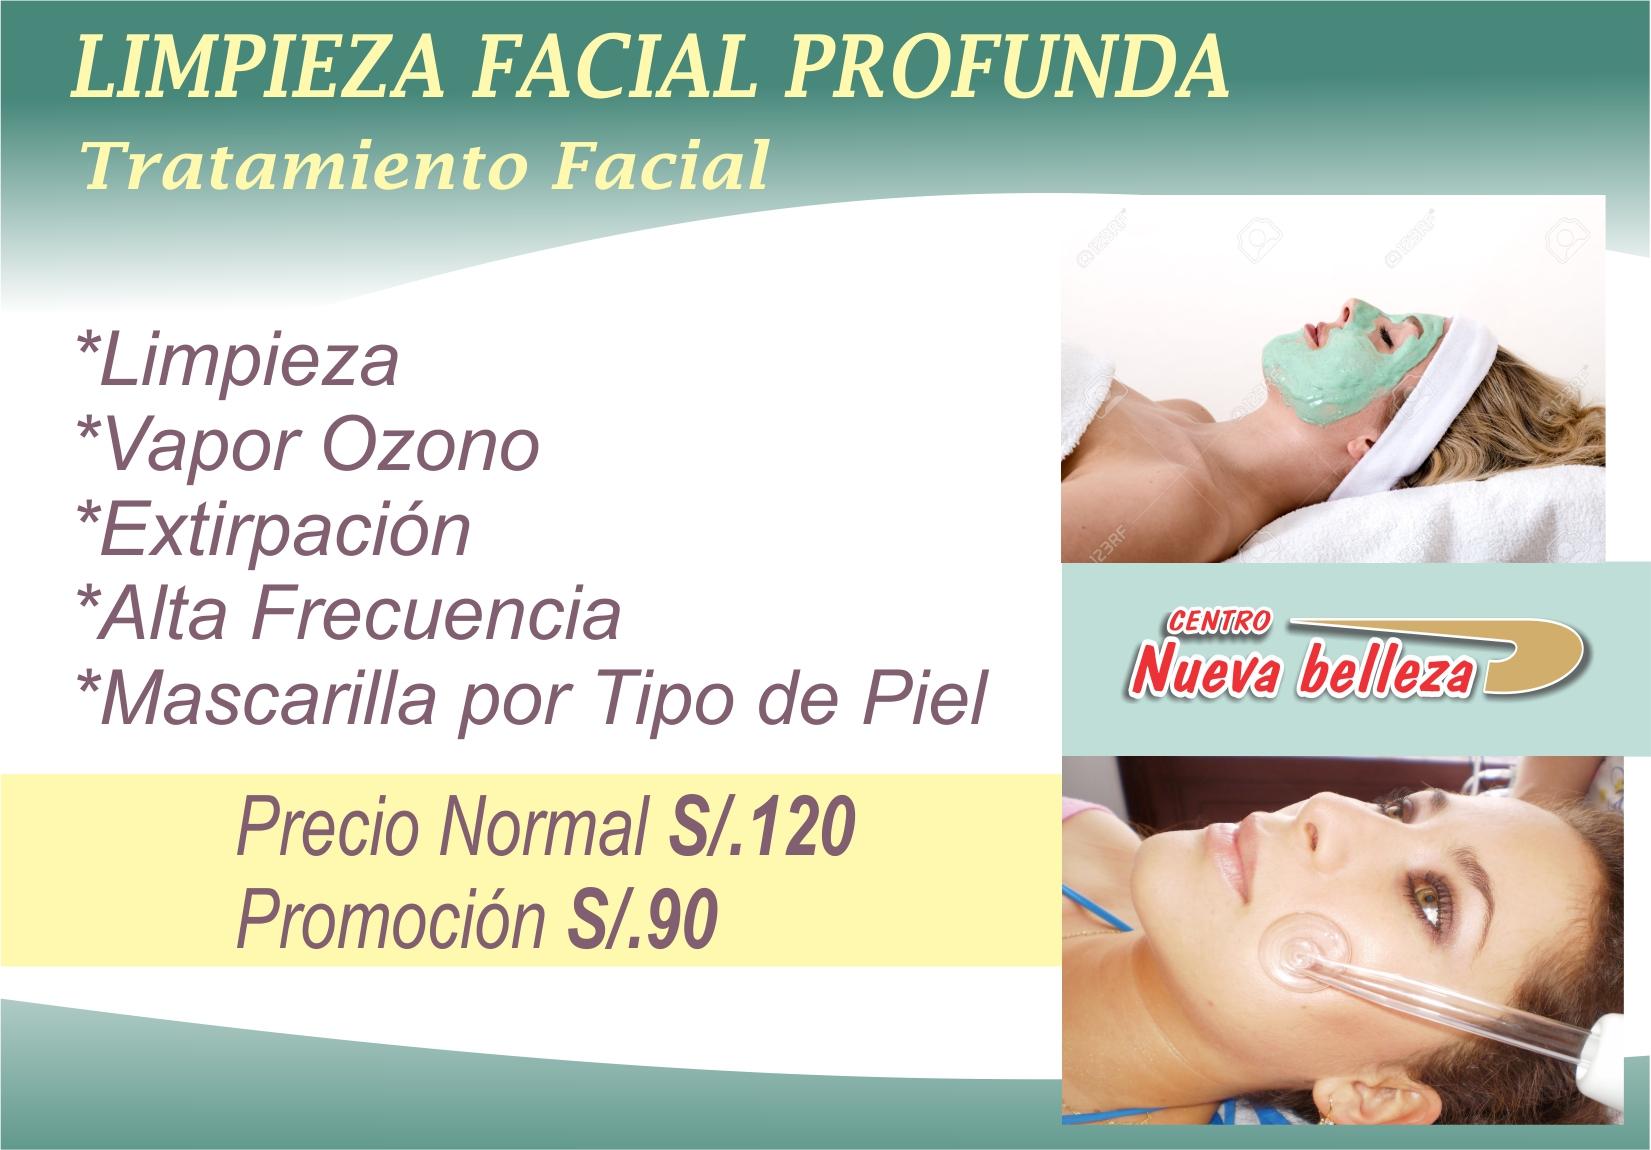 Limpieza Facial Profunda 1